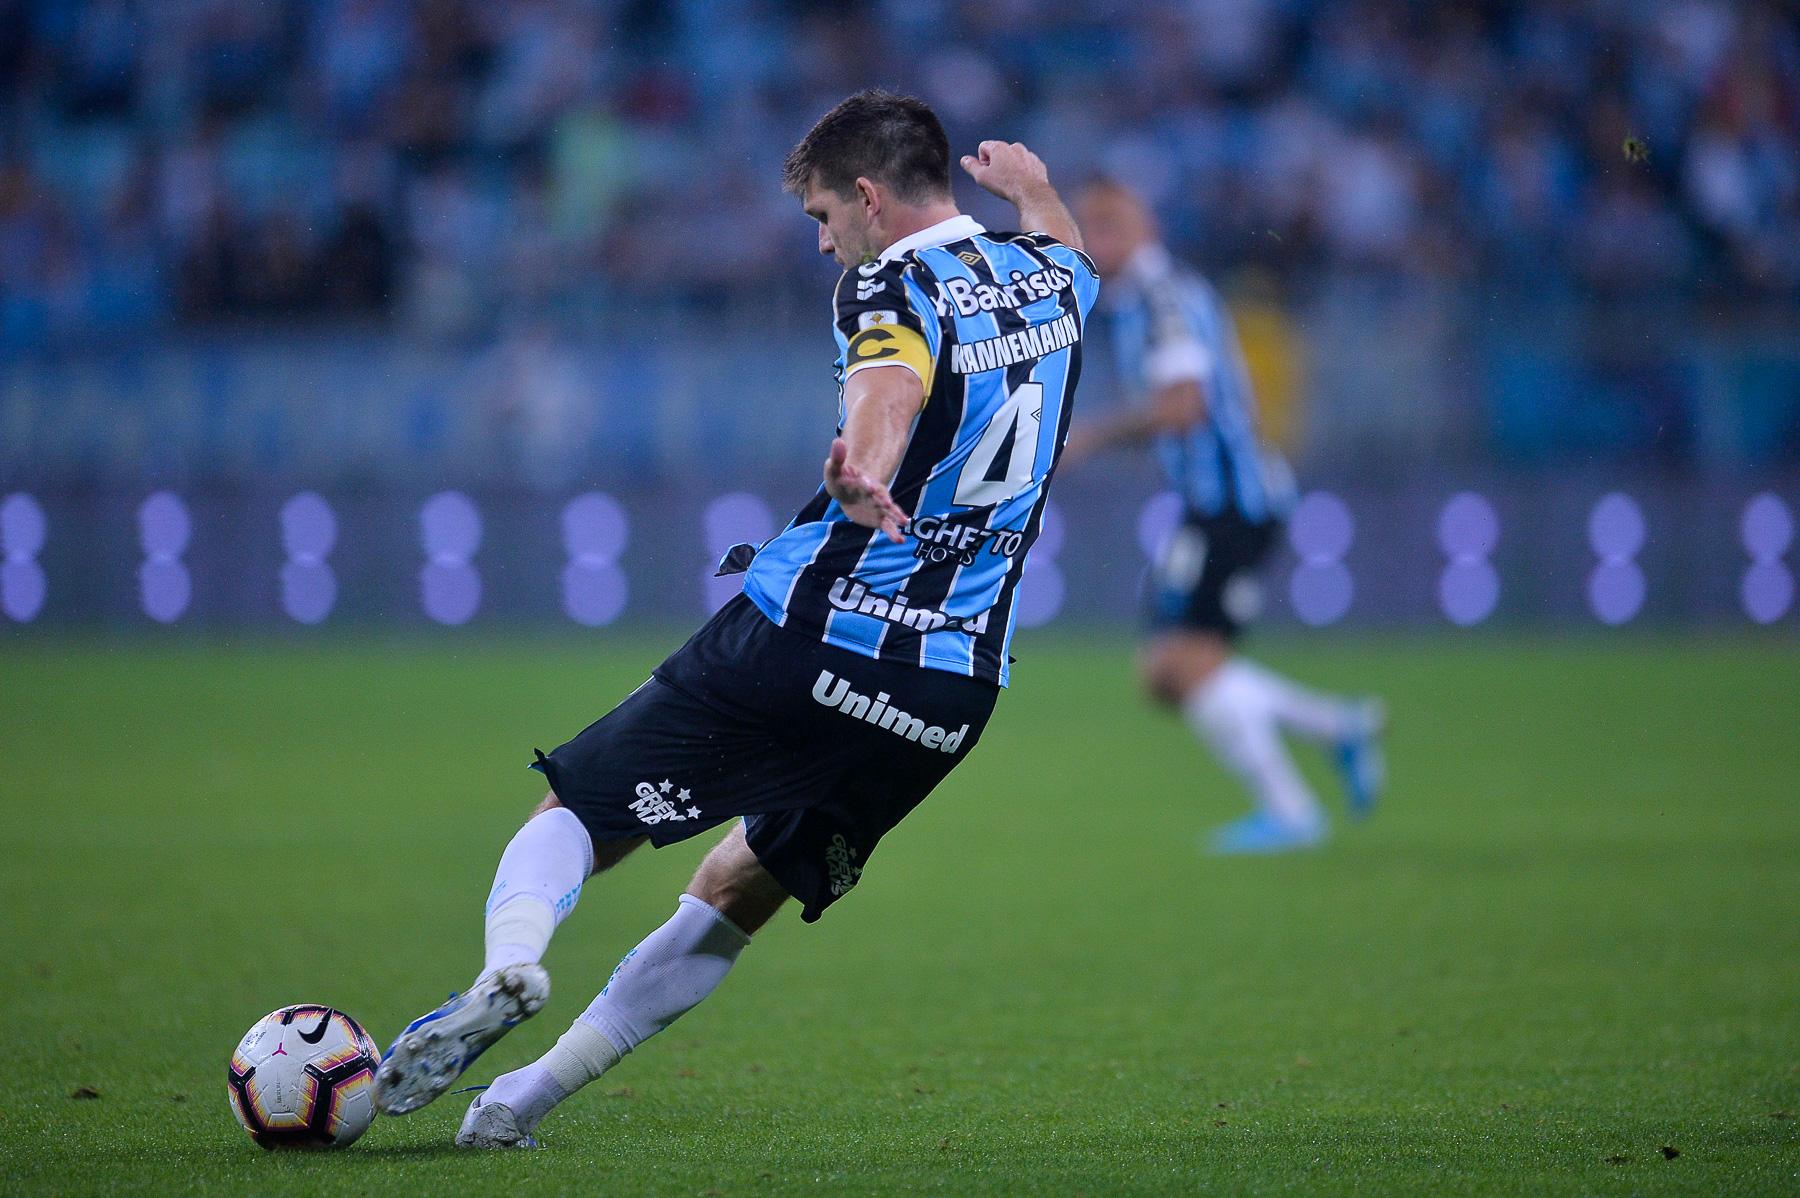 Gremio_X_Flamengo_dudabairros_Eleven_148